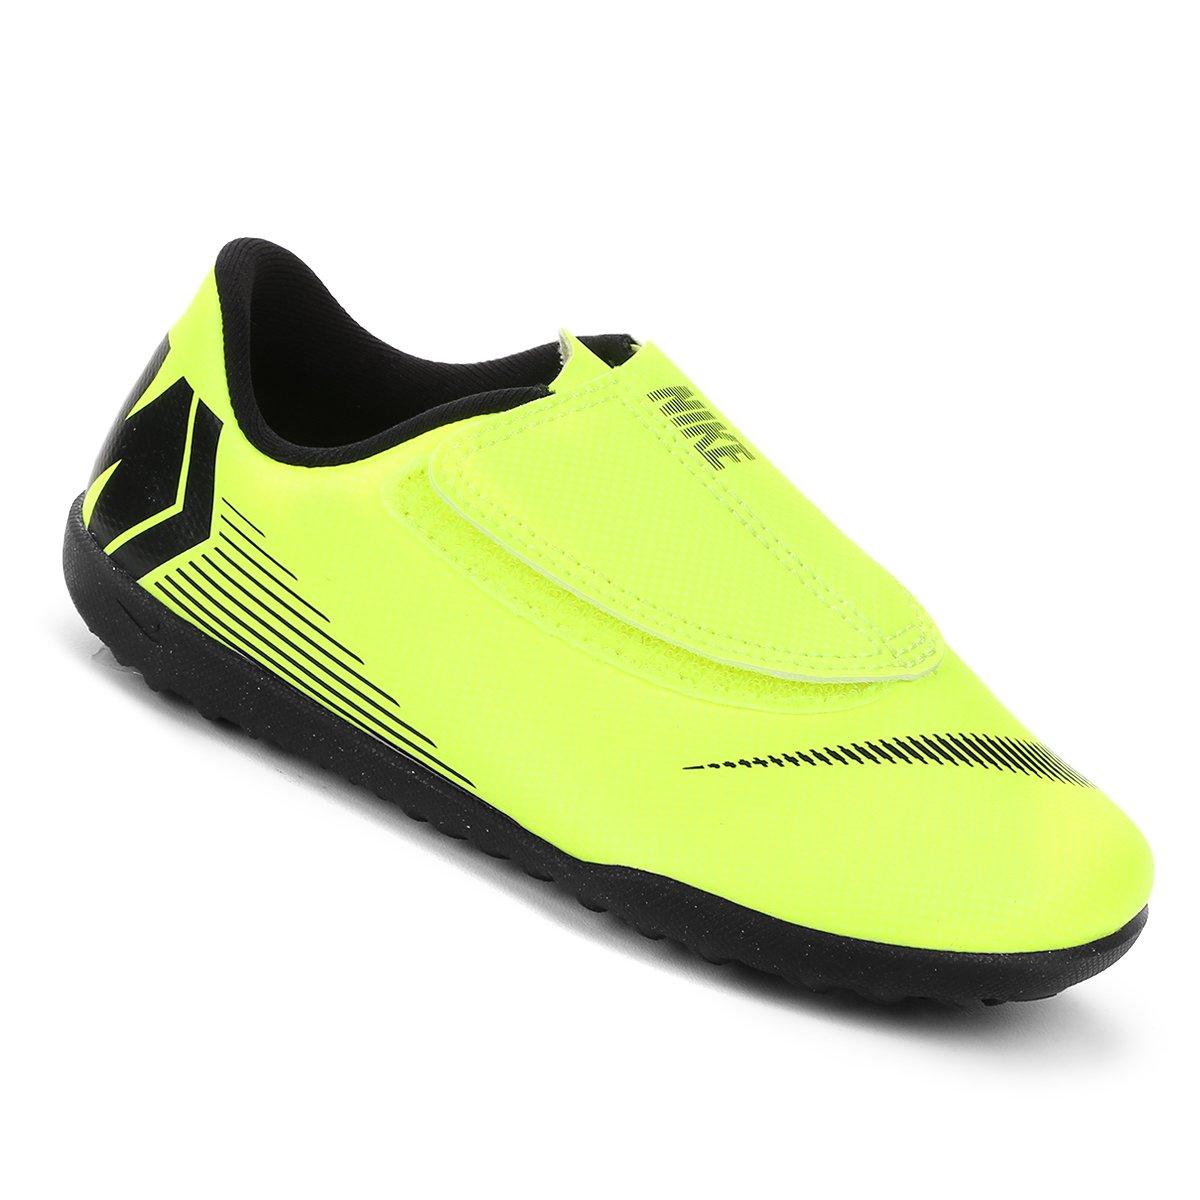 8f4dbbdb1f9c6 Chuteira Society Infantil Nike Vapor 12 Club TF - Compre Agora ...